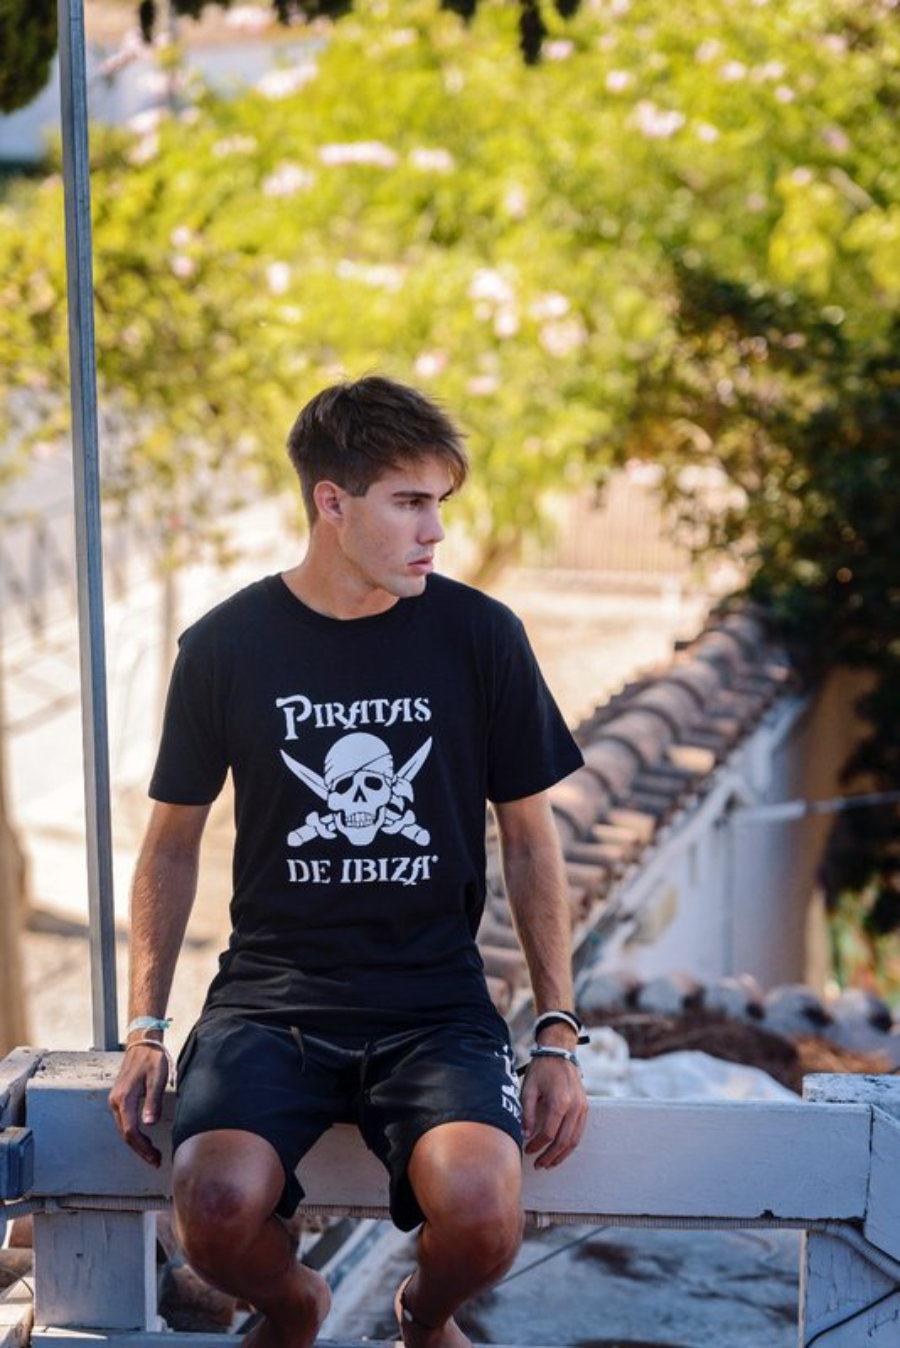 Classic Pirates T-Shirt